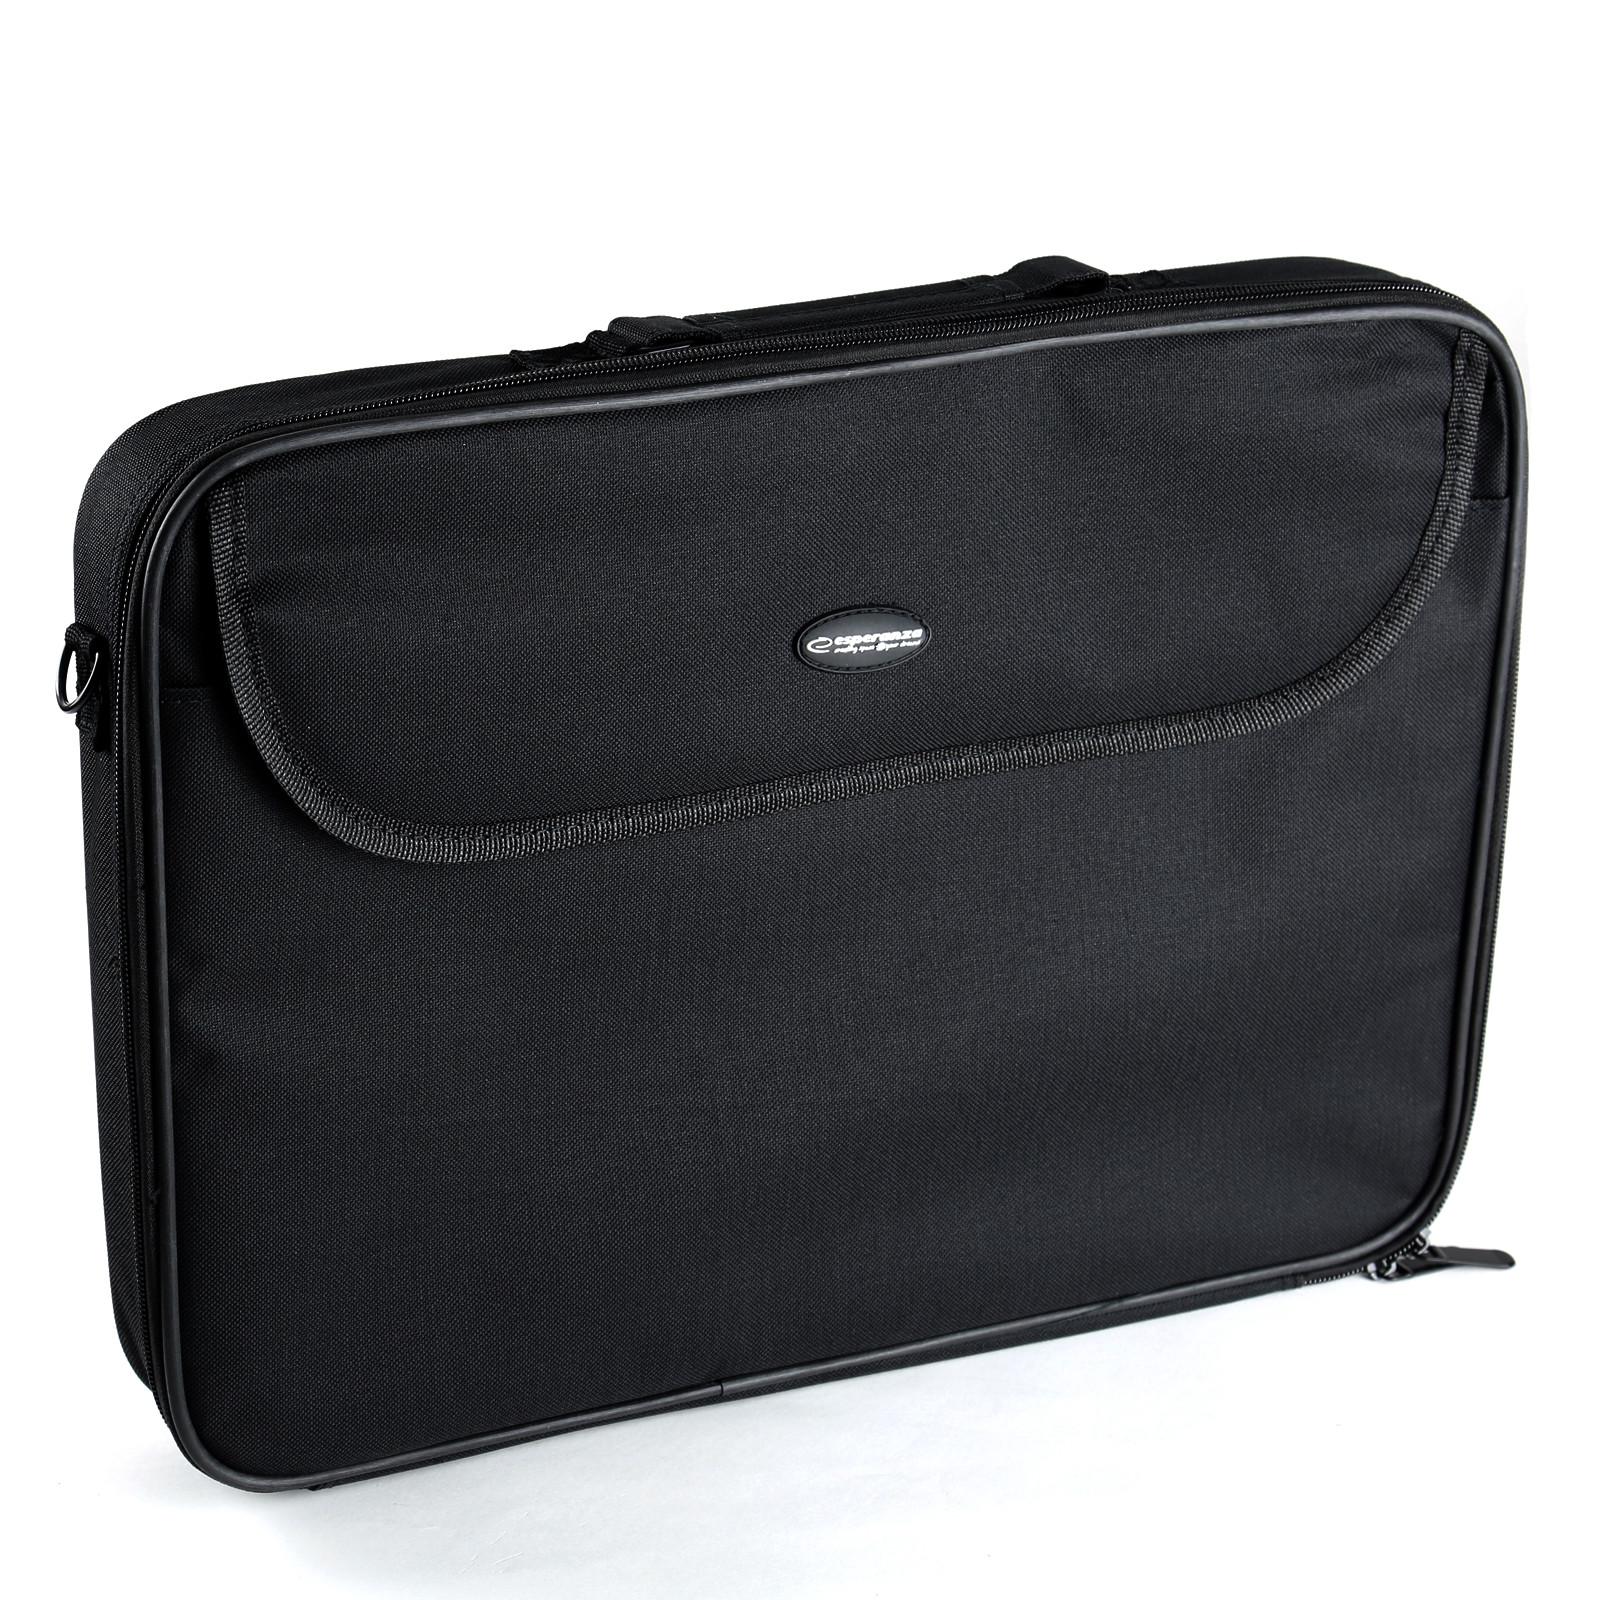 laptoptasche notebooktasche laptop notebook tasche 17 zoll. Black Bedroom Furniture Sets. Home Design Ideas